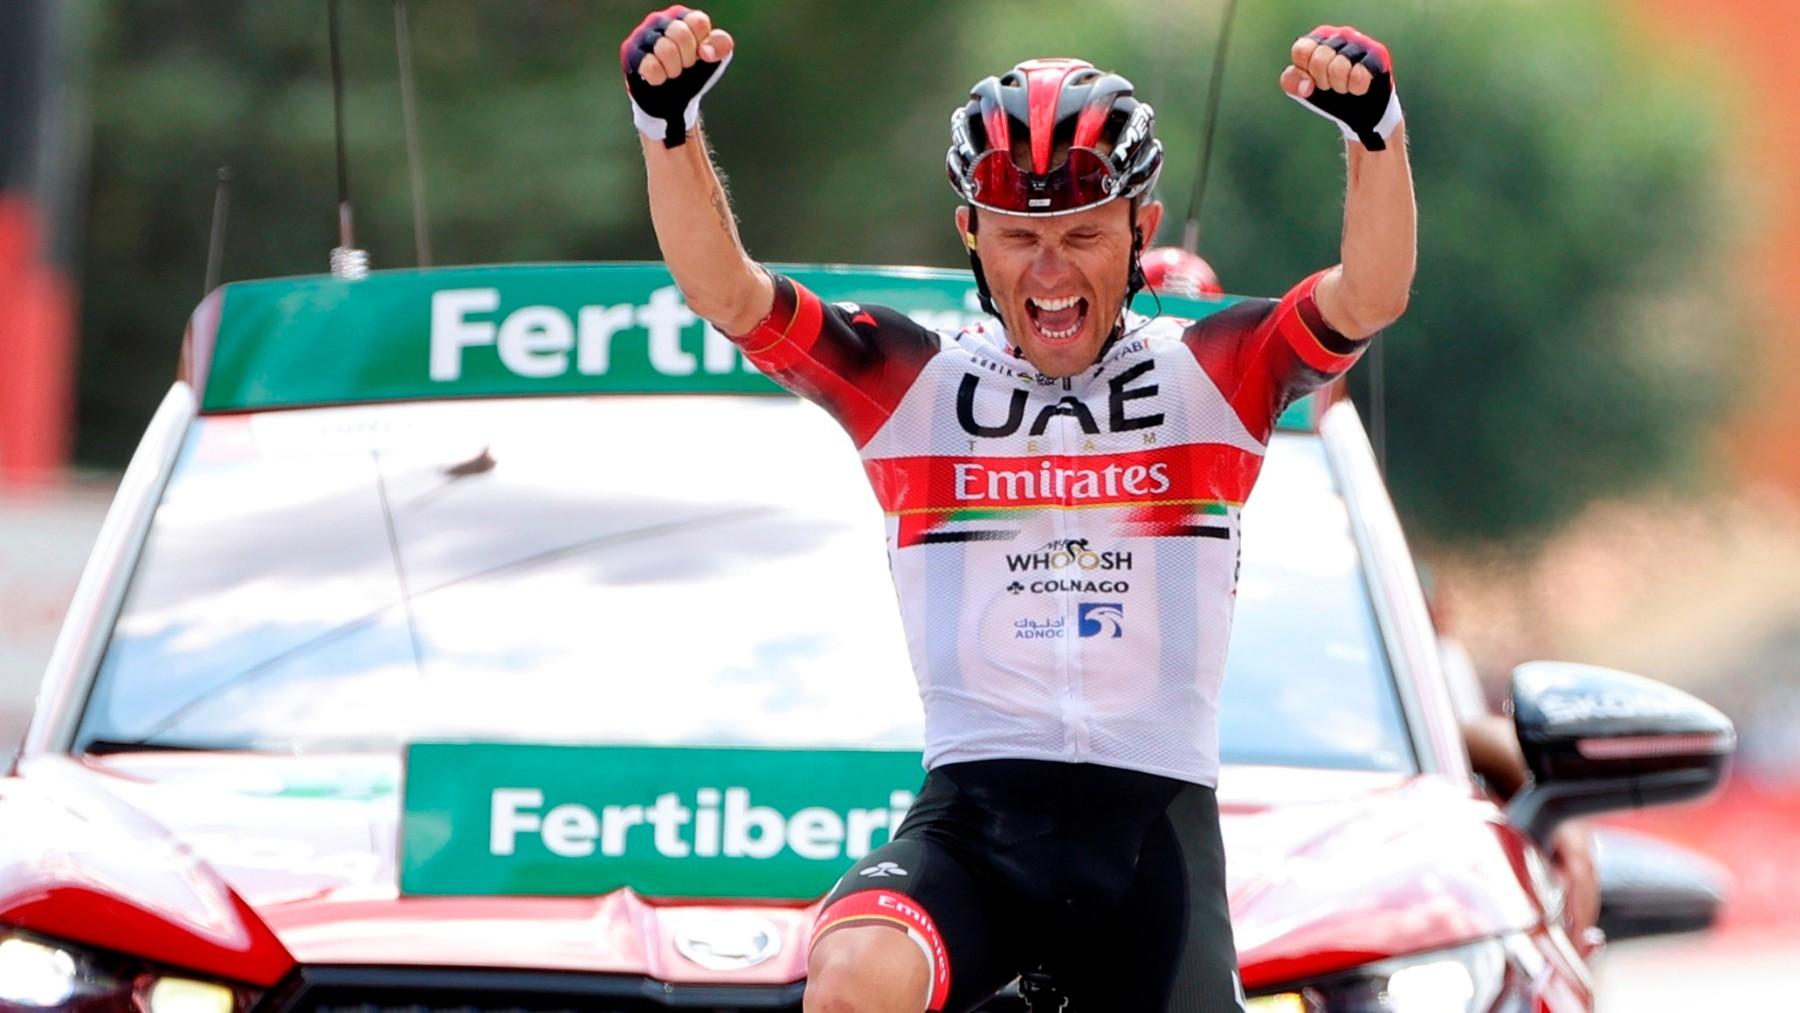 Majka celebra su victoria en La Vuelta. (EFE)